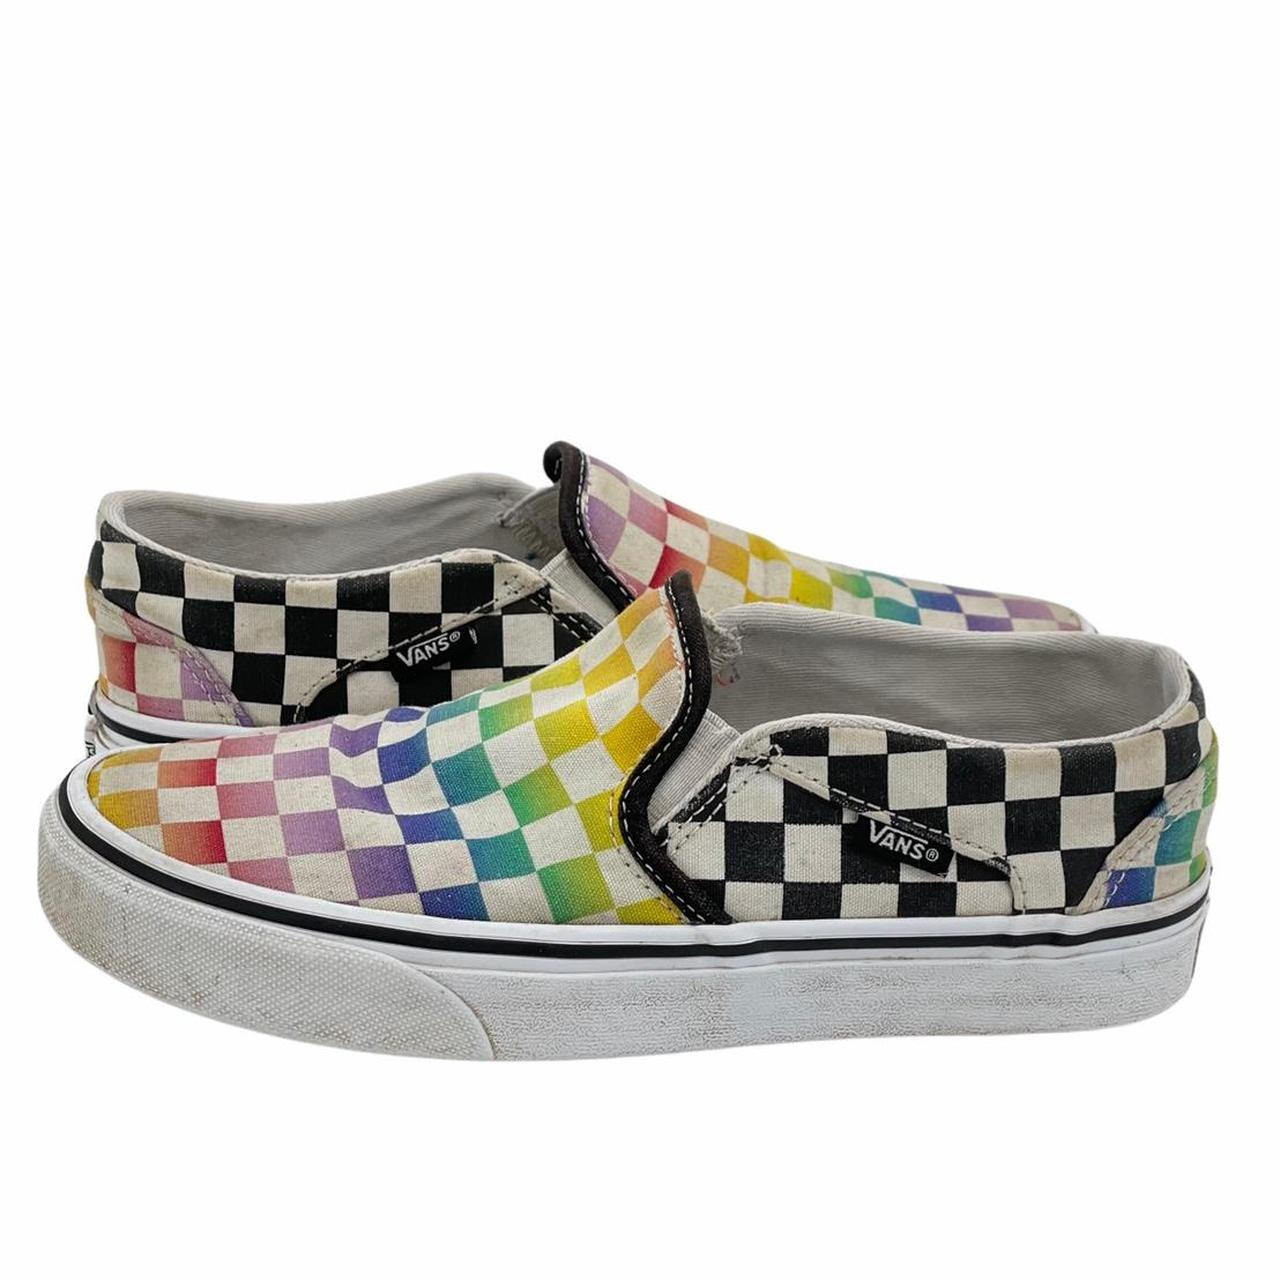 Product Image 1 - Vans Slip On Rainbow Checkerboard